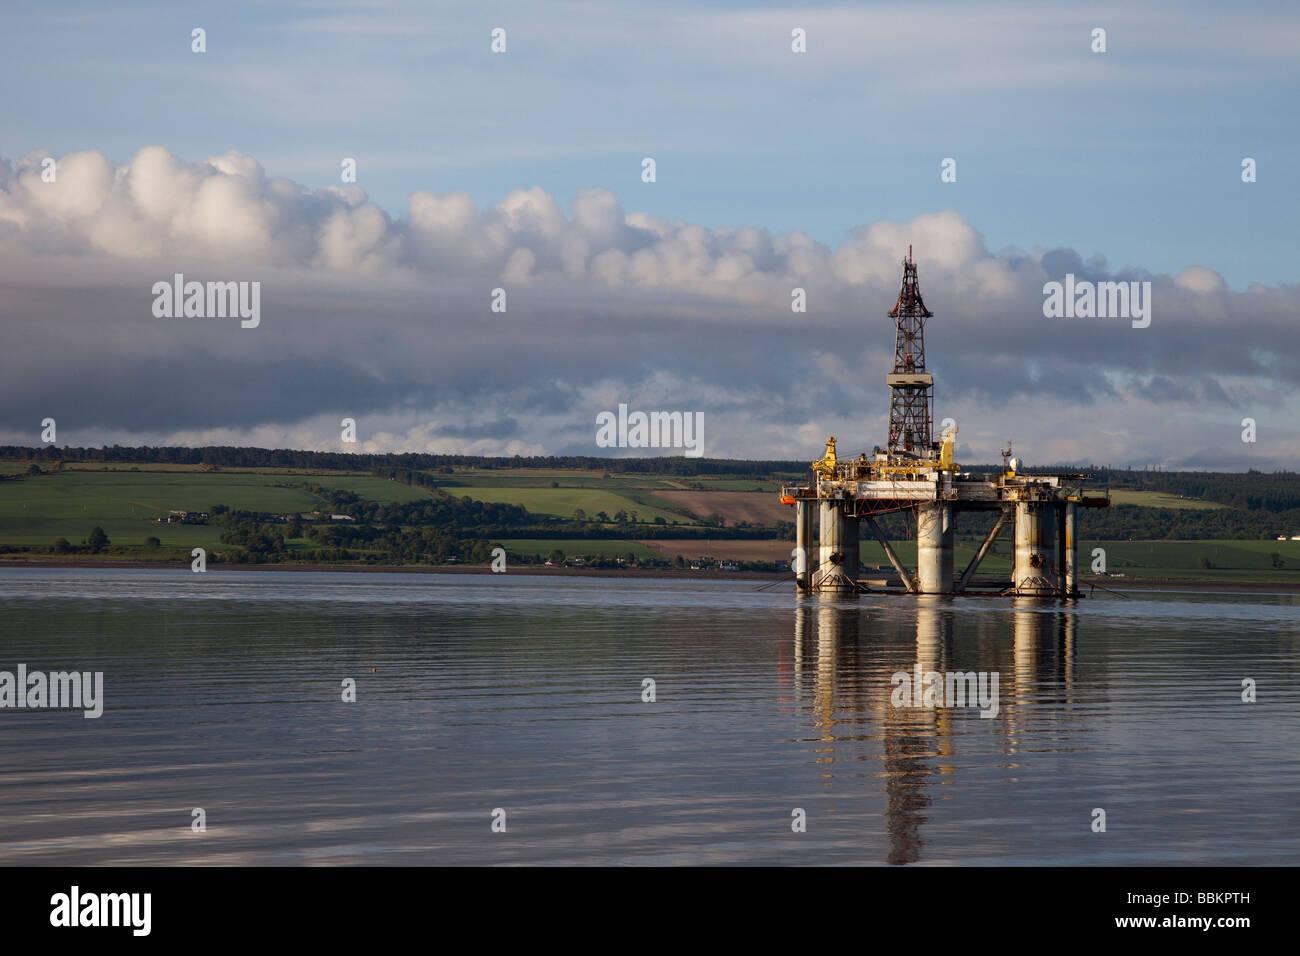 GSF Arctic II platform at Invergordon, Cromarty Firth, Ross-shire, Scotland, UK - Stock Image